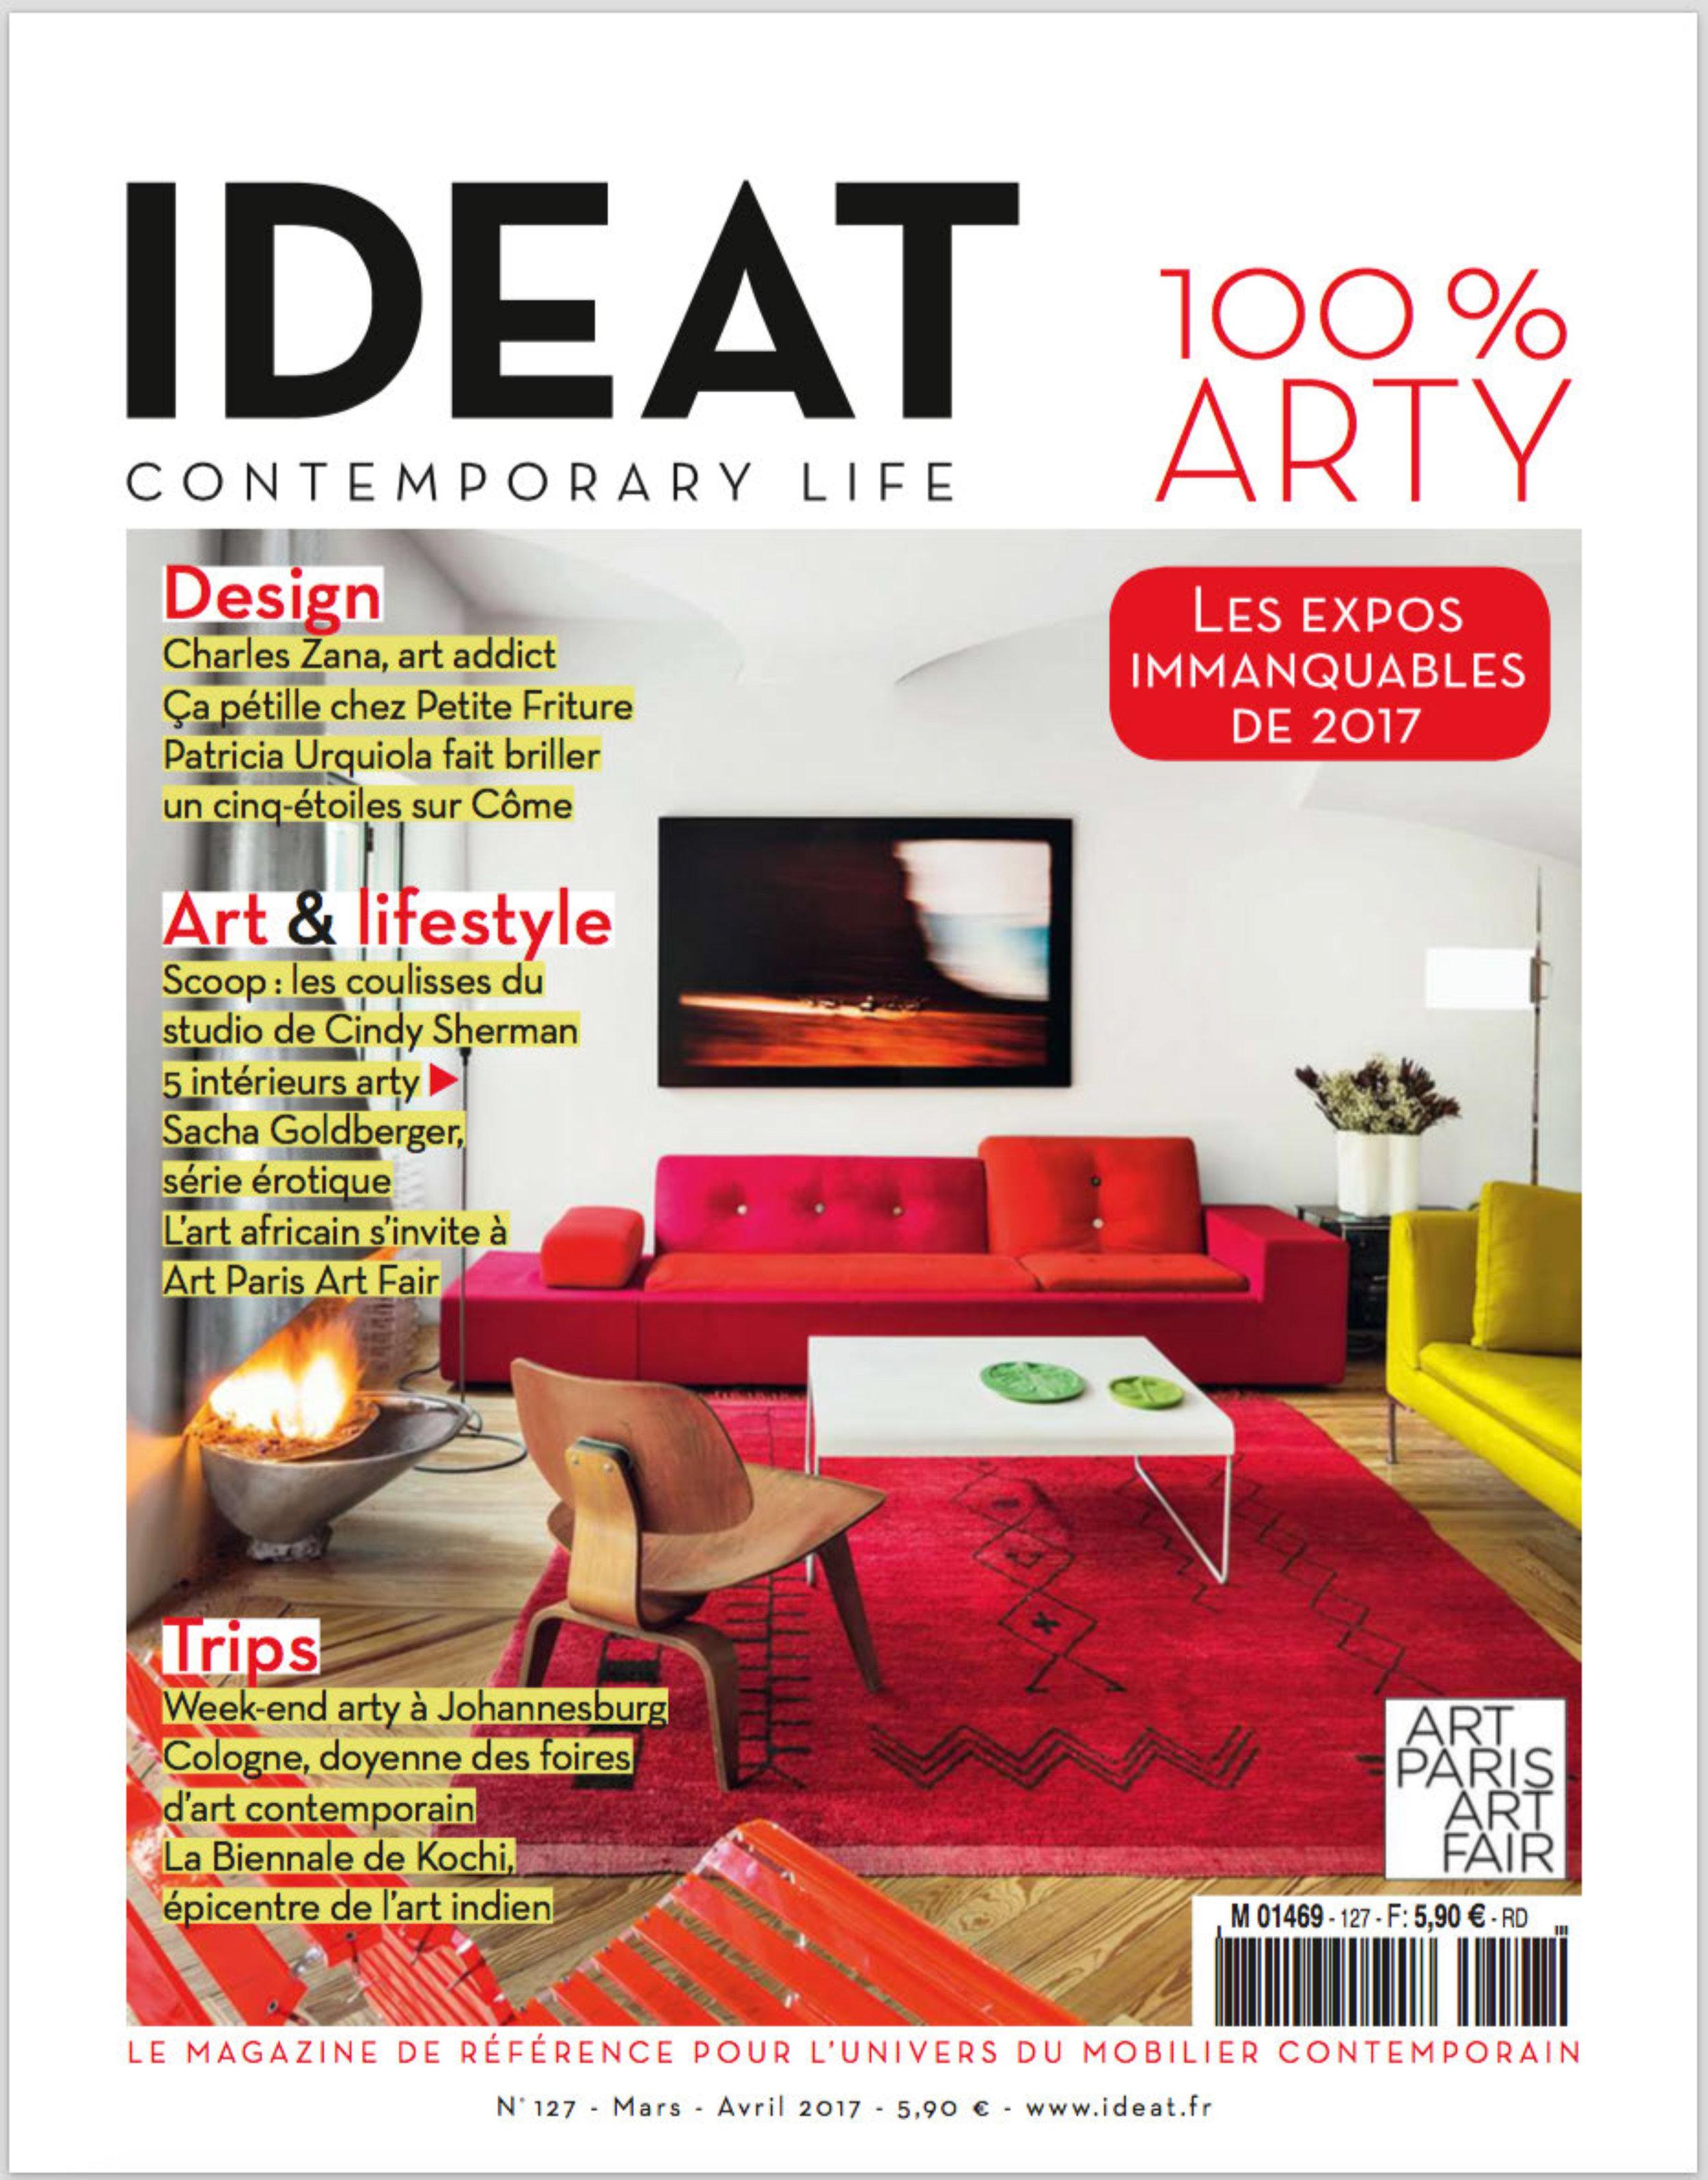 Ideat_art_house-1.jpg